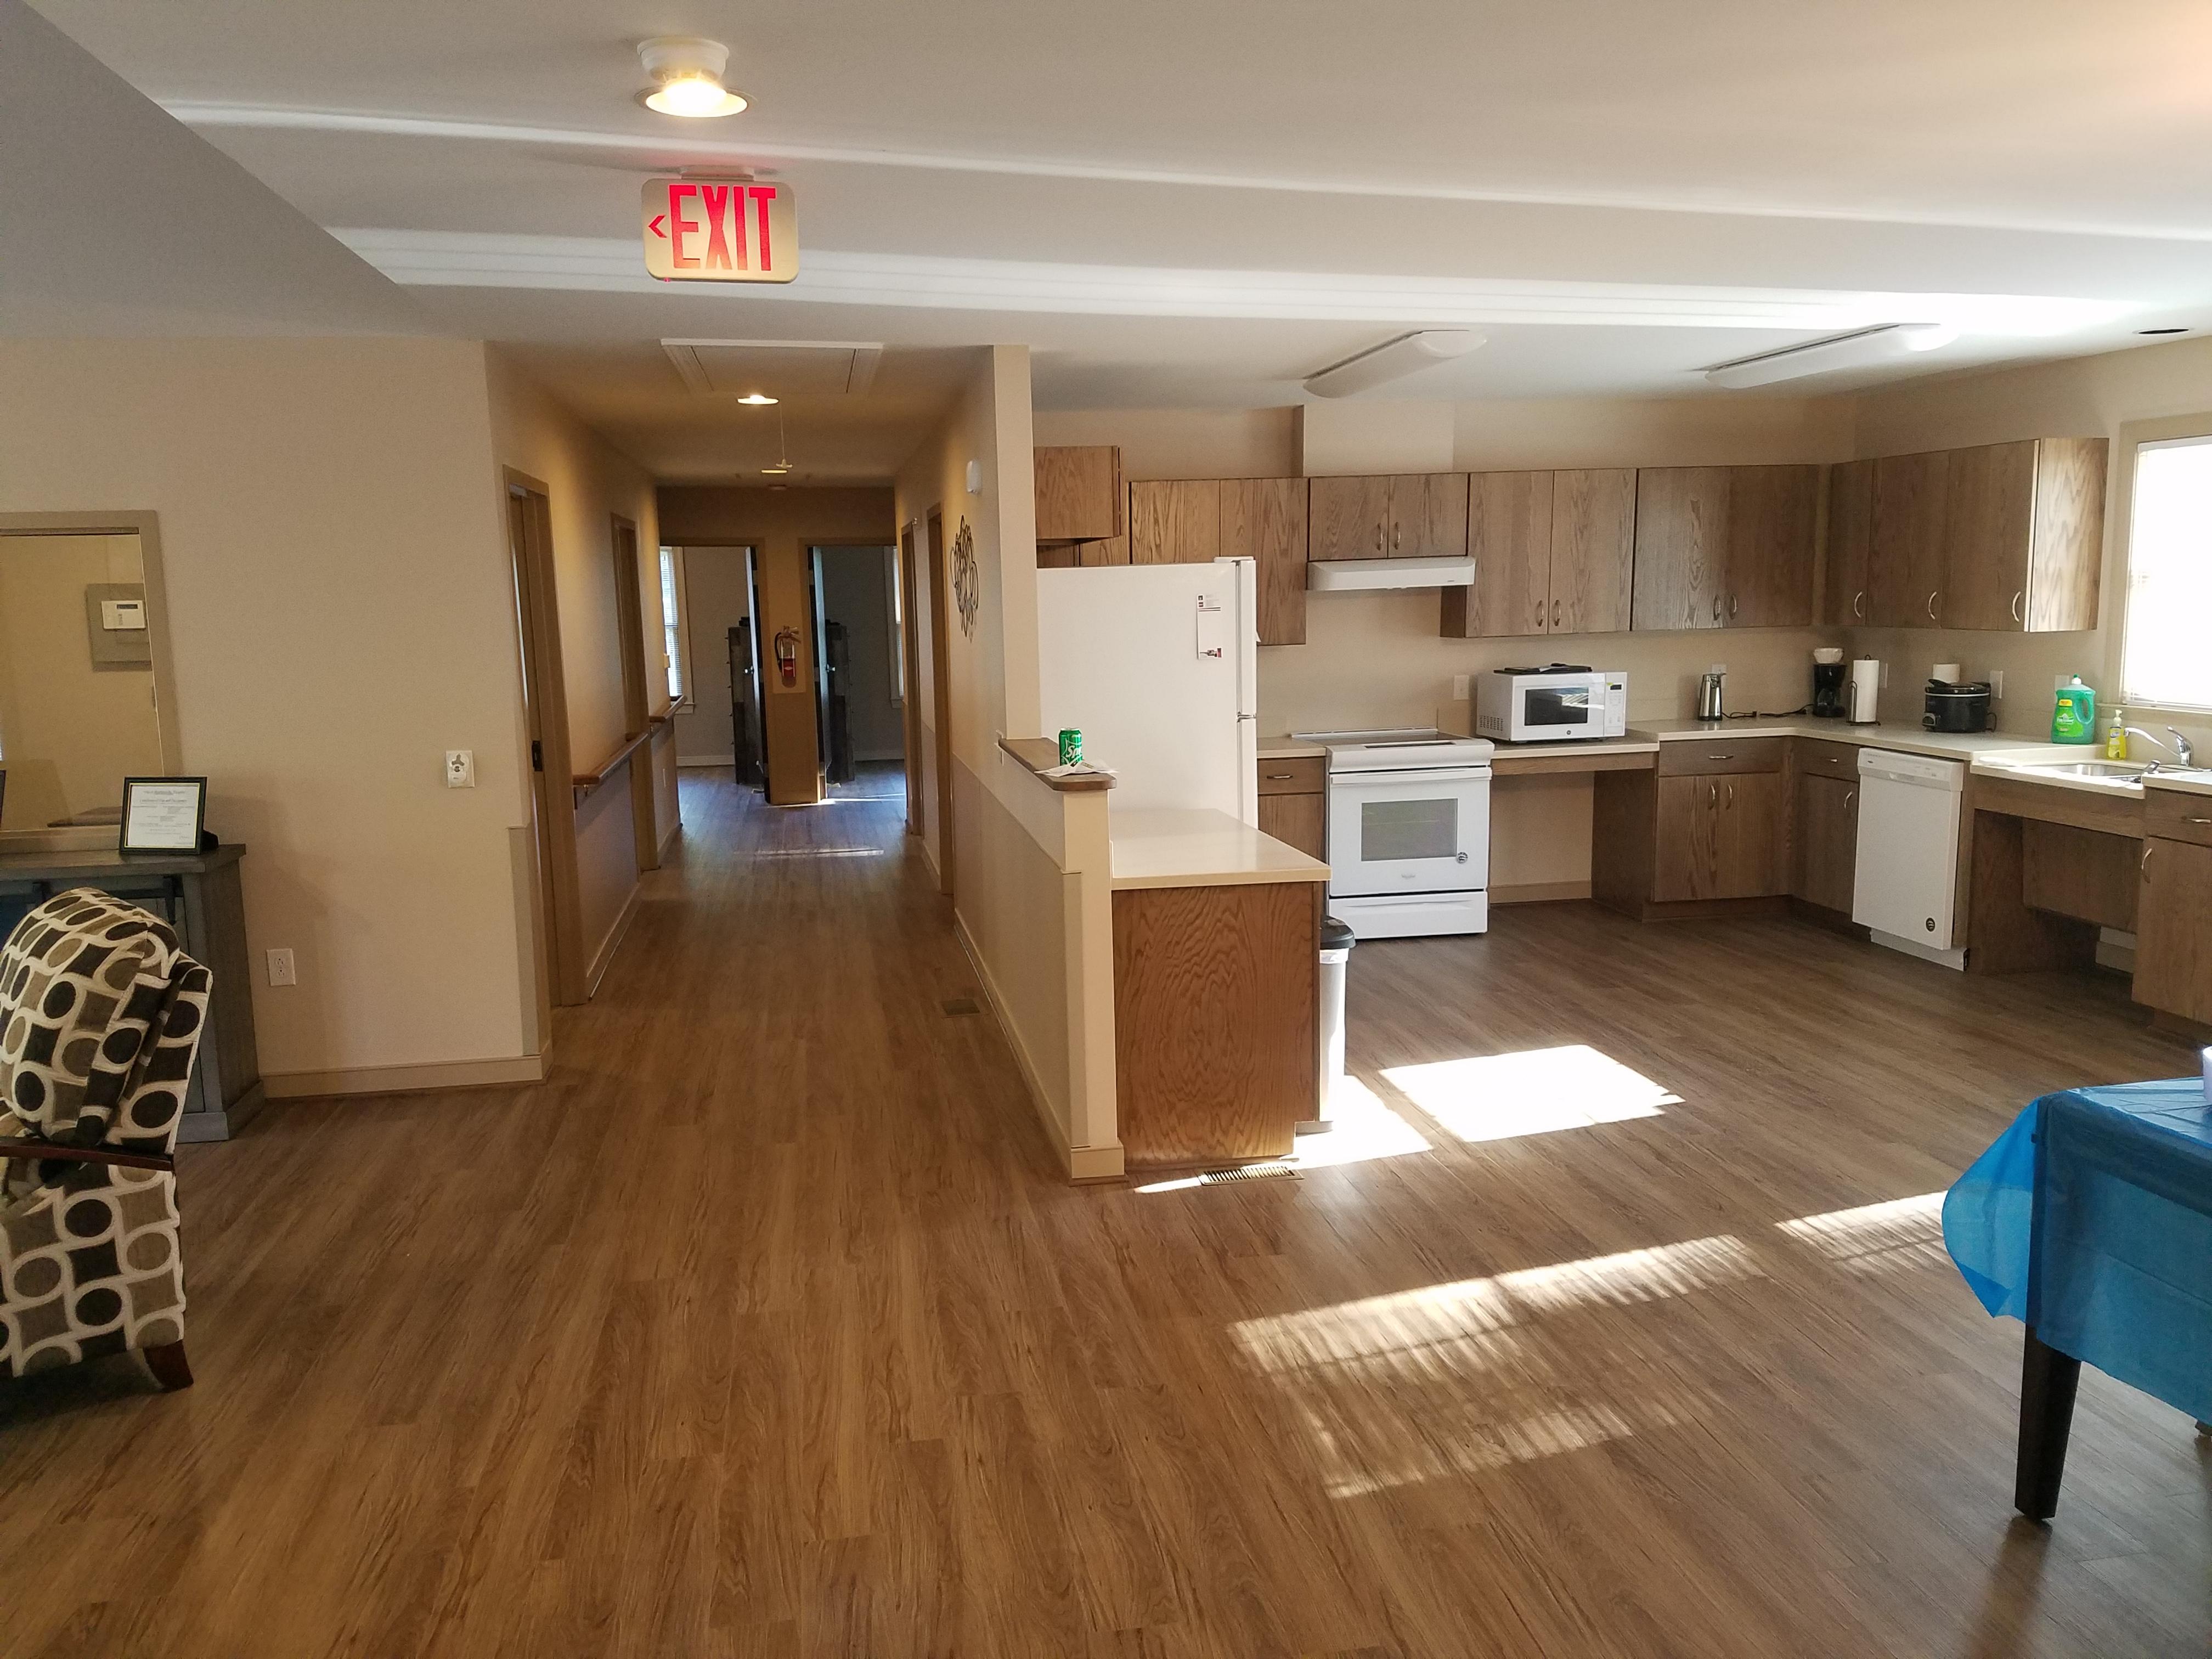 Livingroom and kitchen area